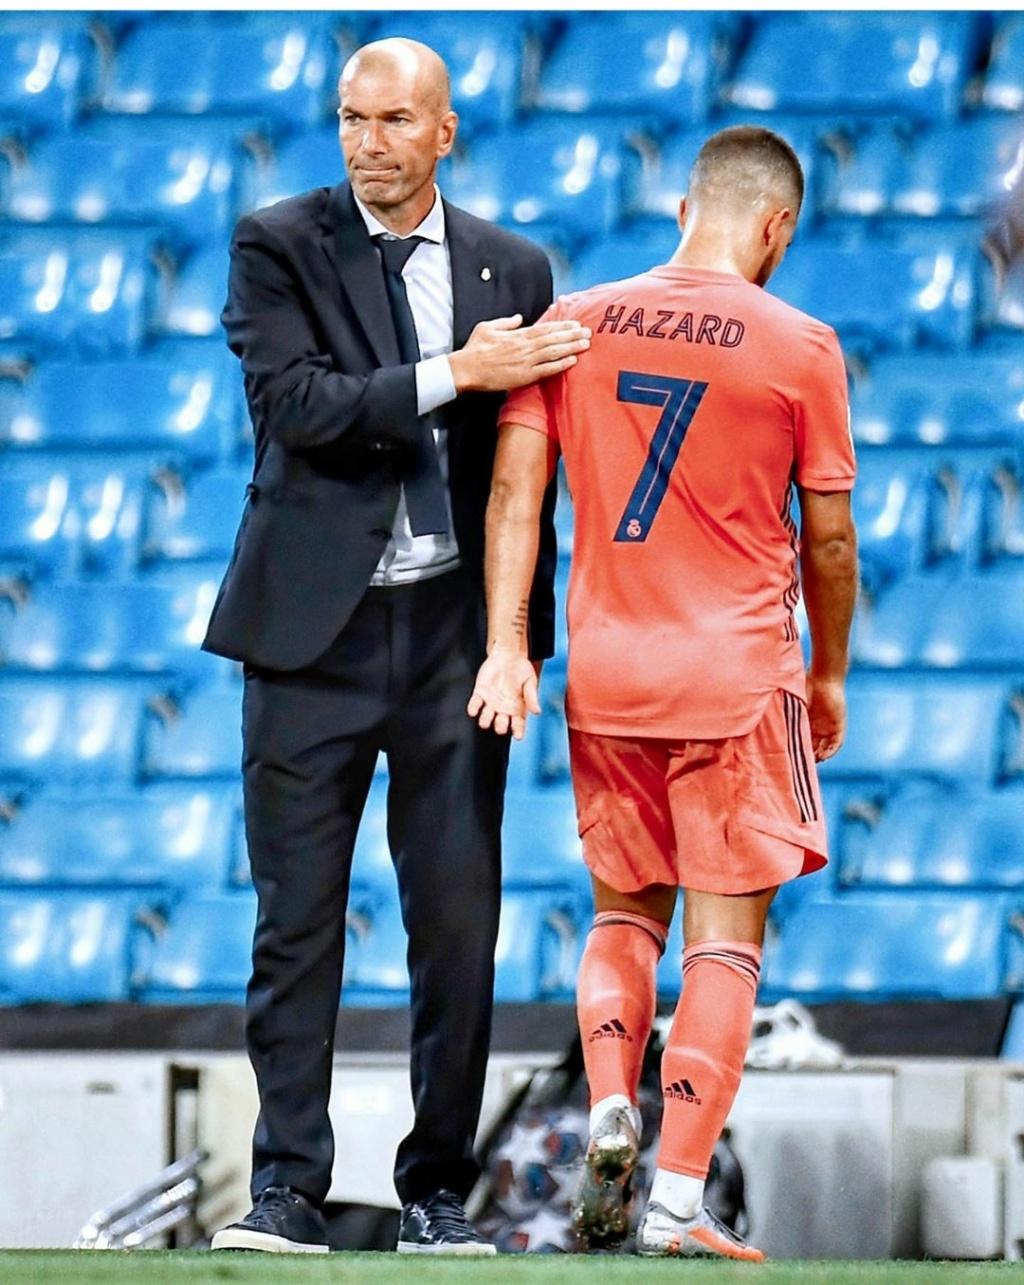 ¿Cuánto mide Zinedine Zidane? - Altura - Real height Img_2093